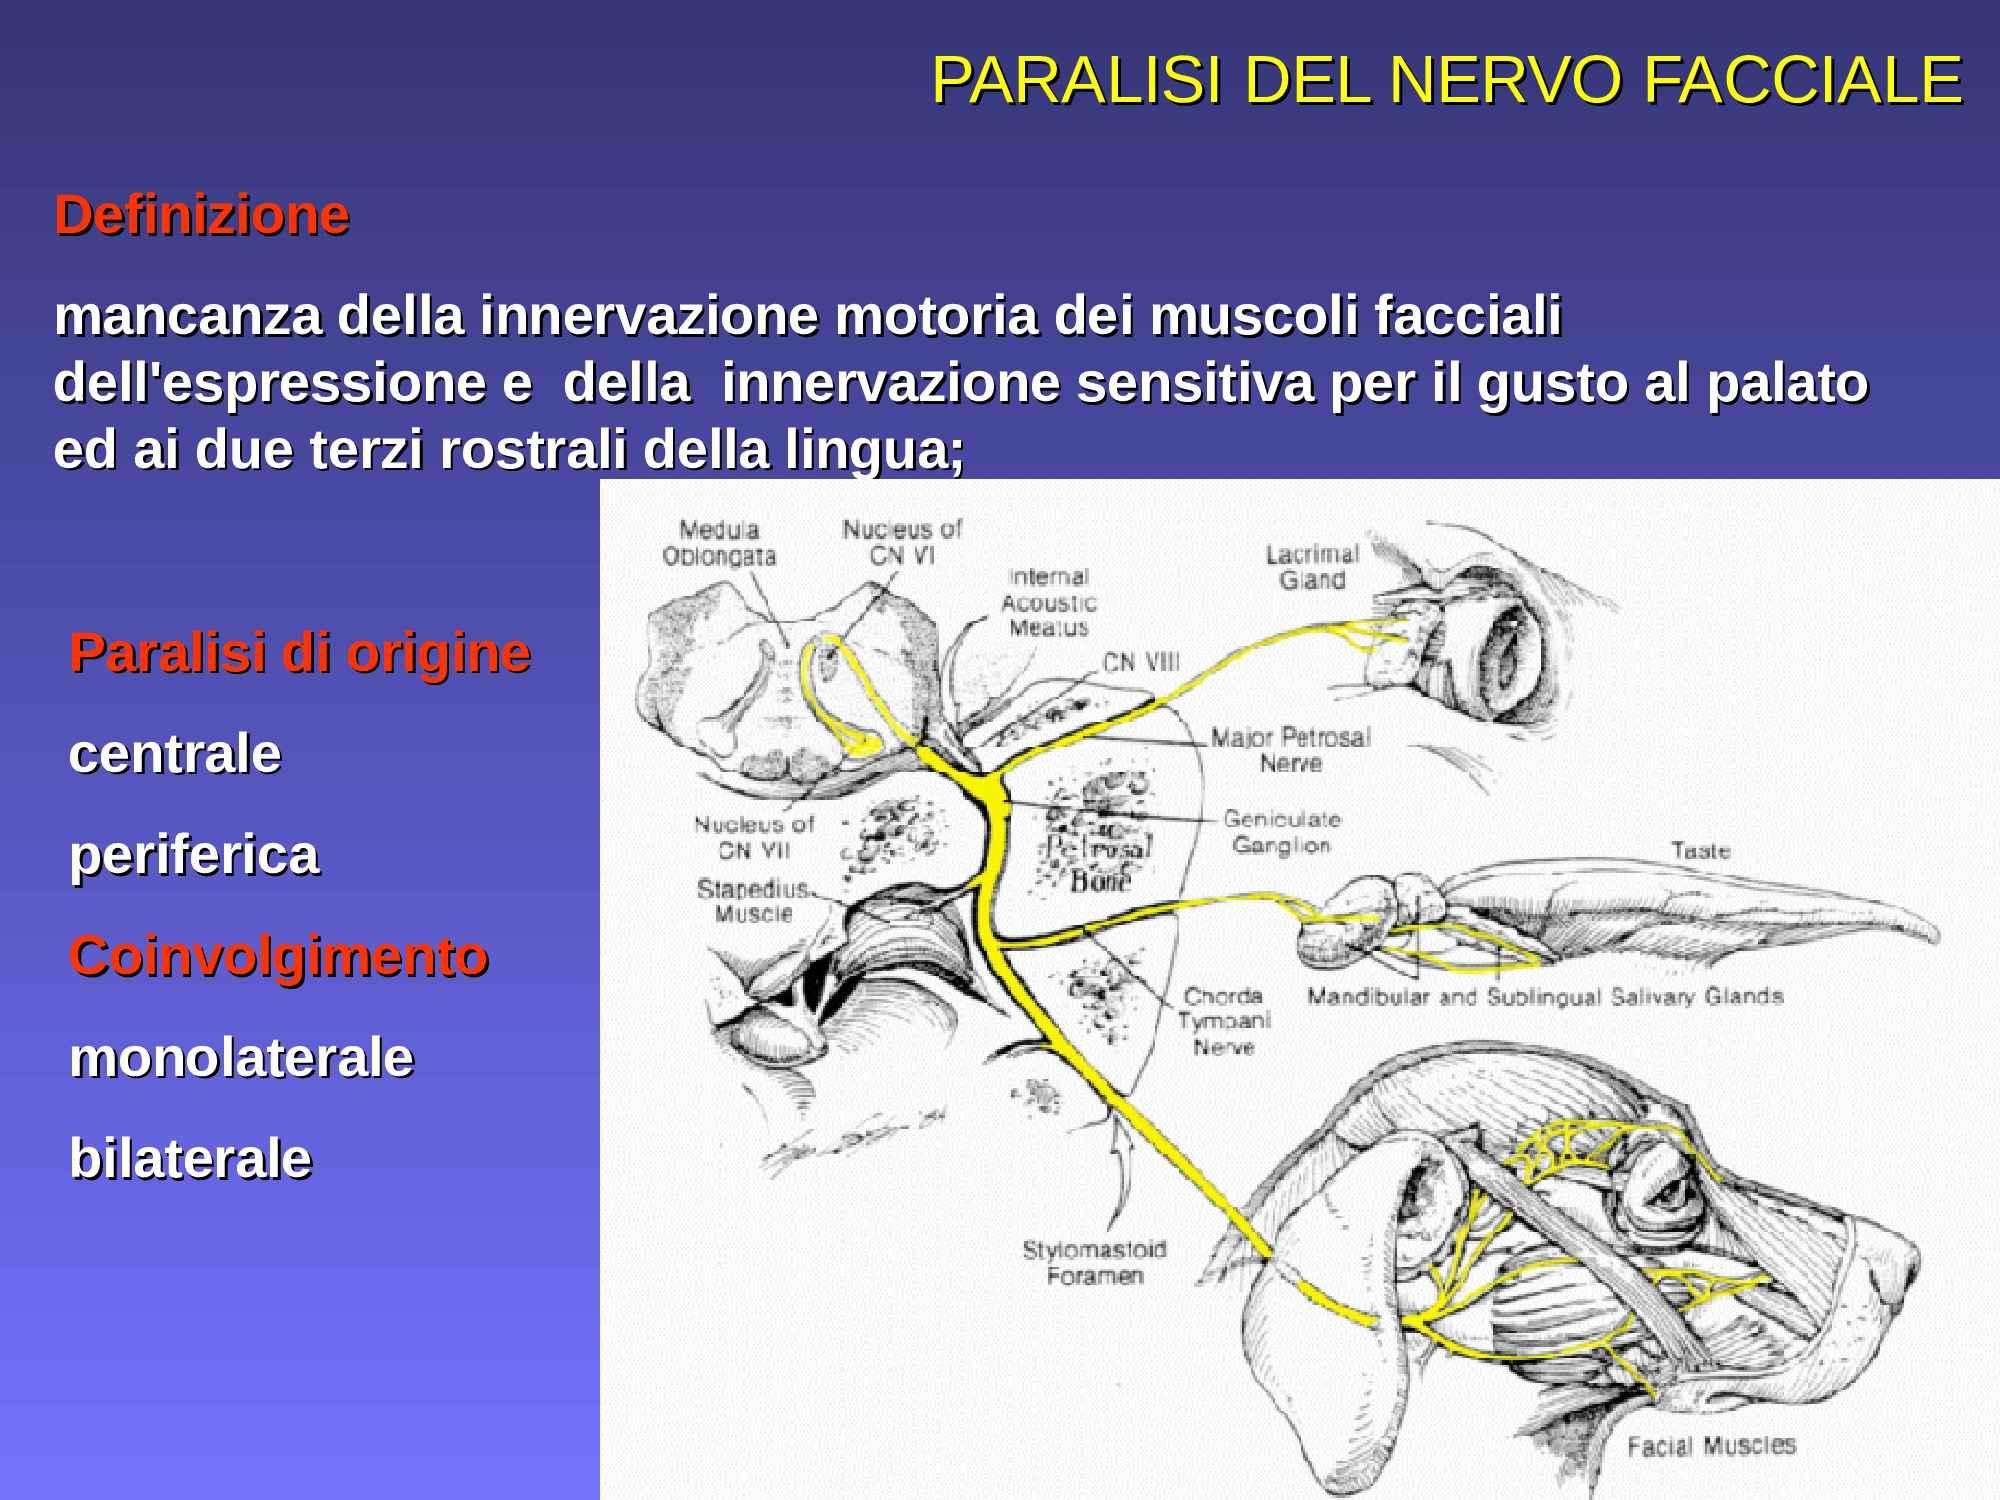 Paralisi del nervo facciale